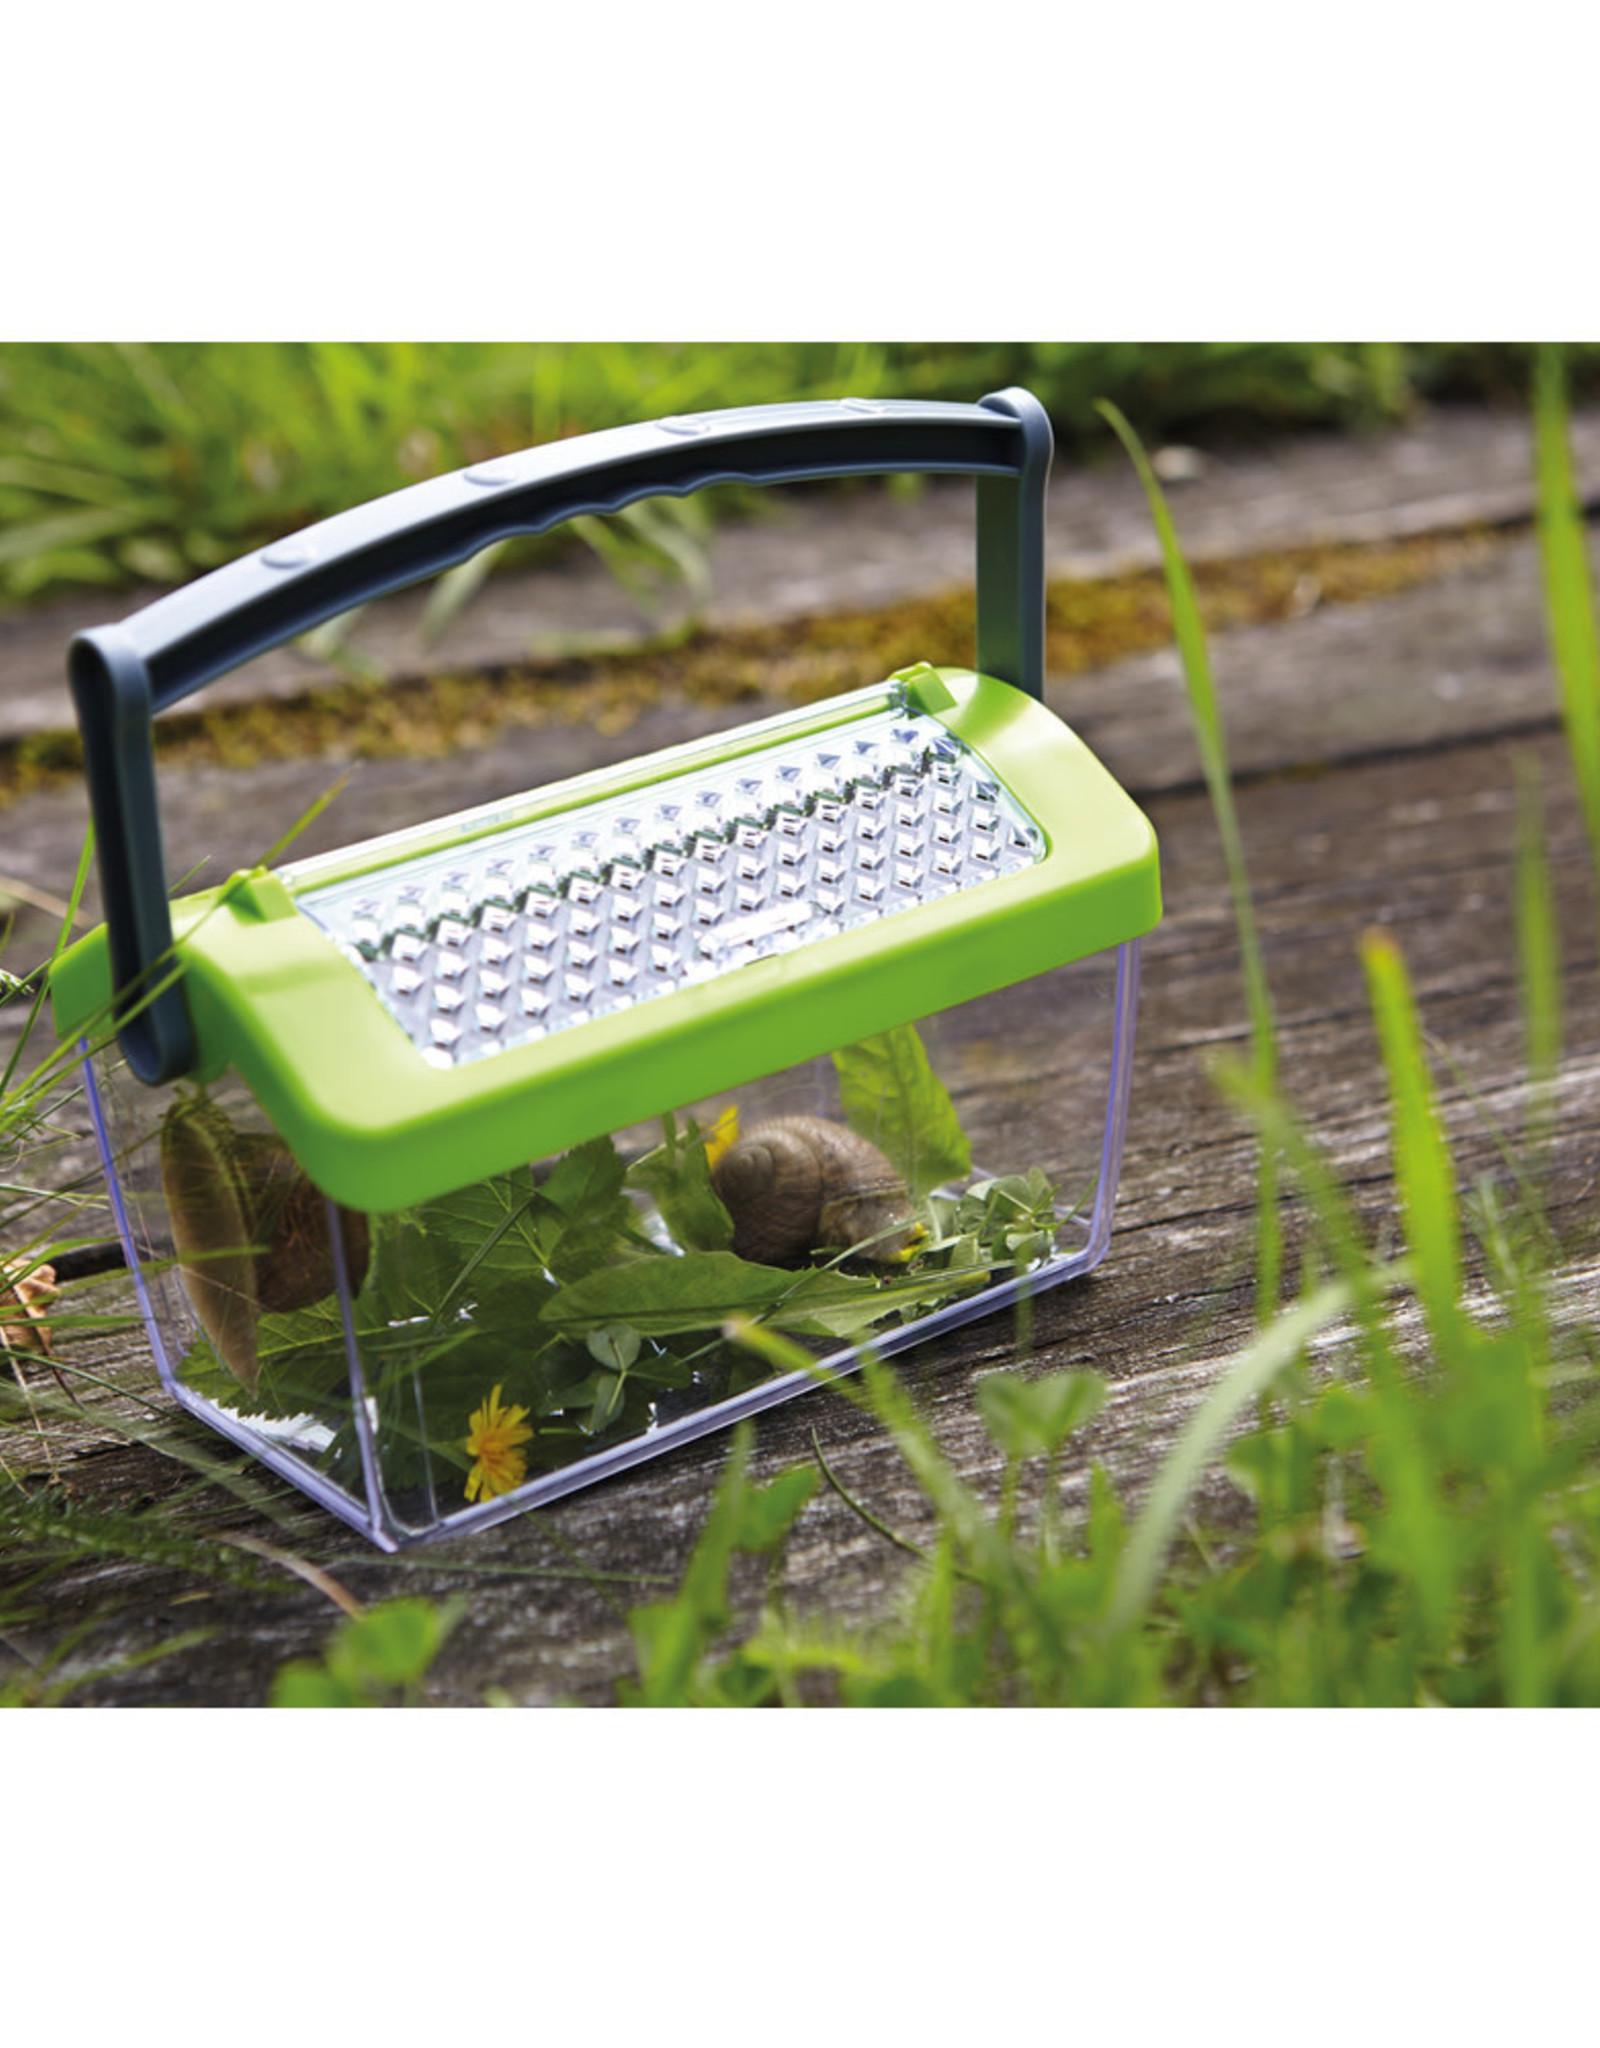 HABA Insectenbox